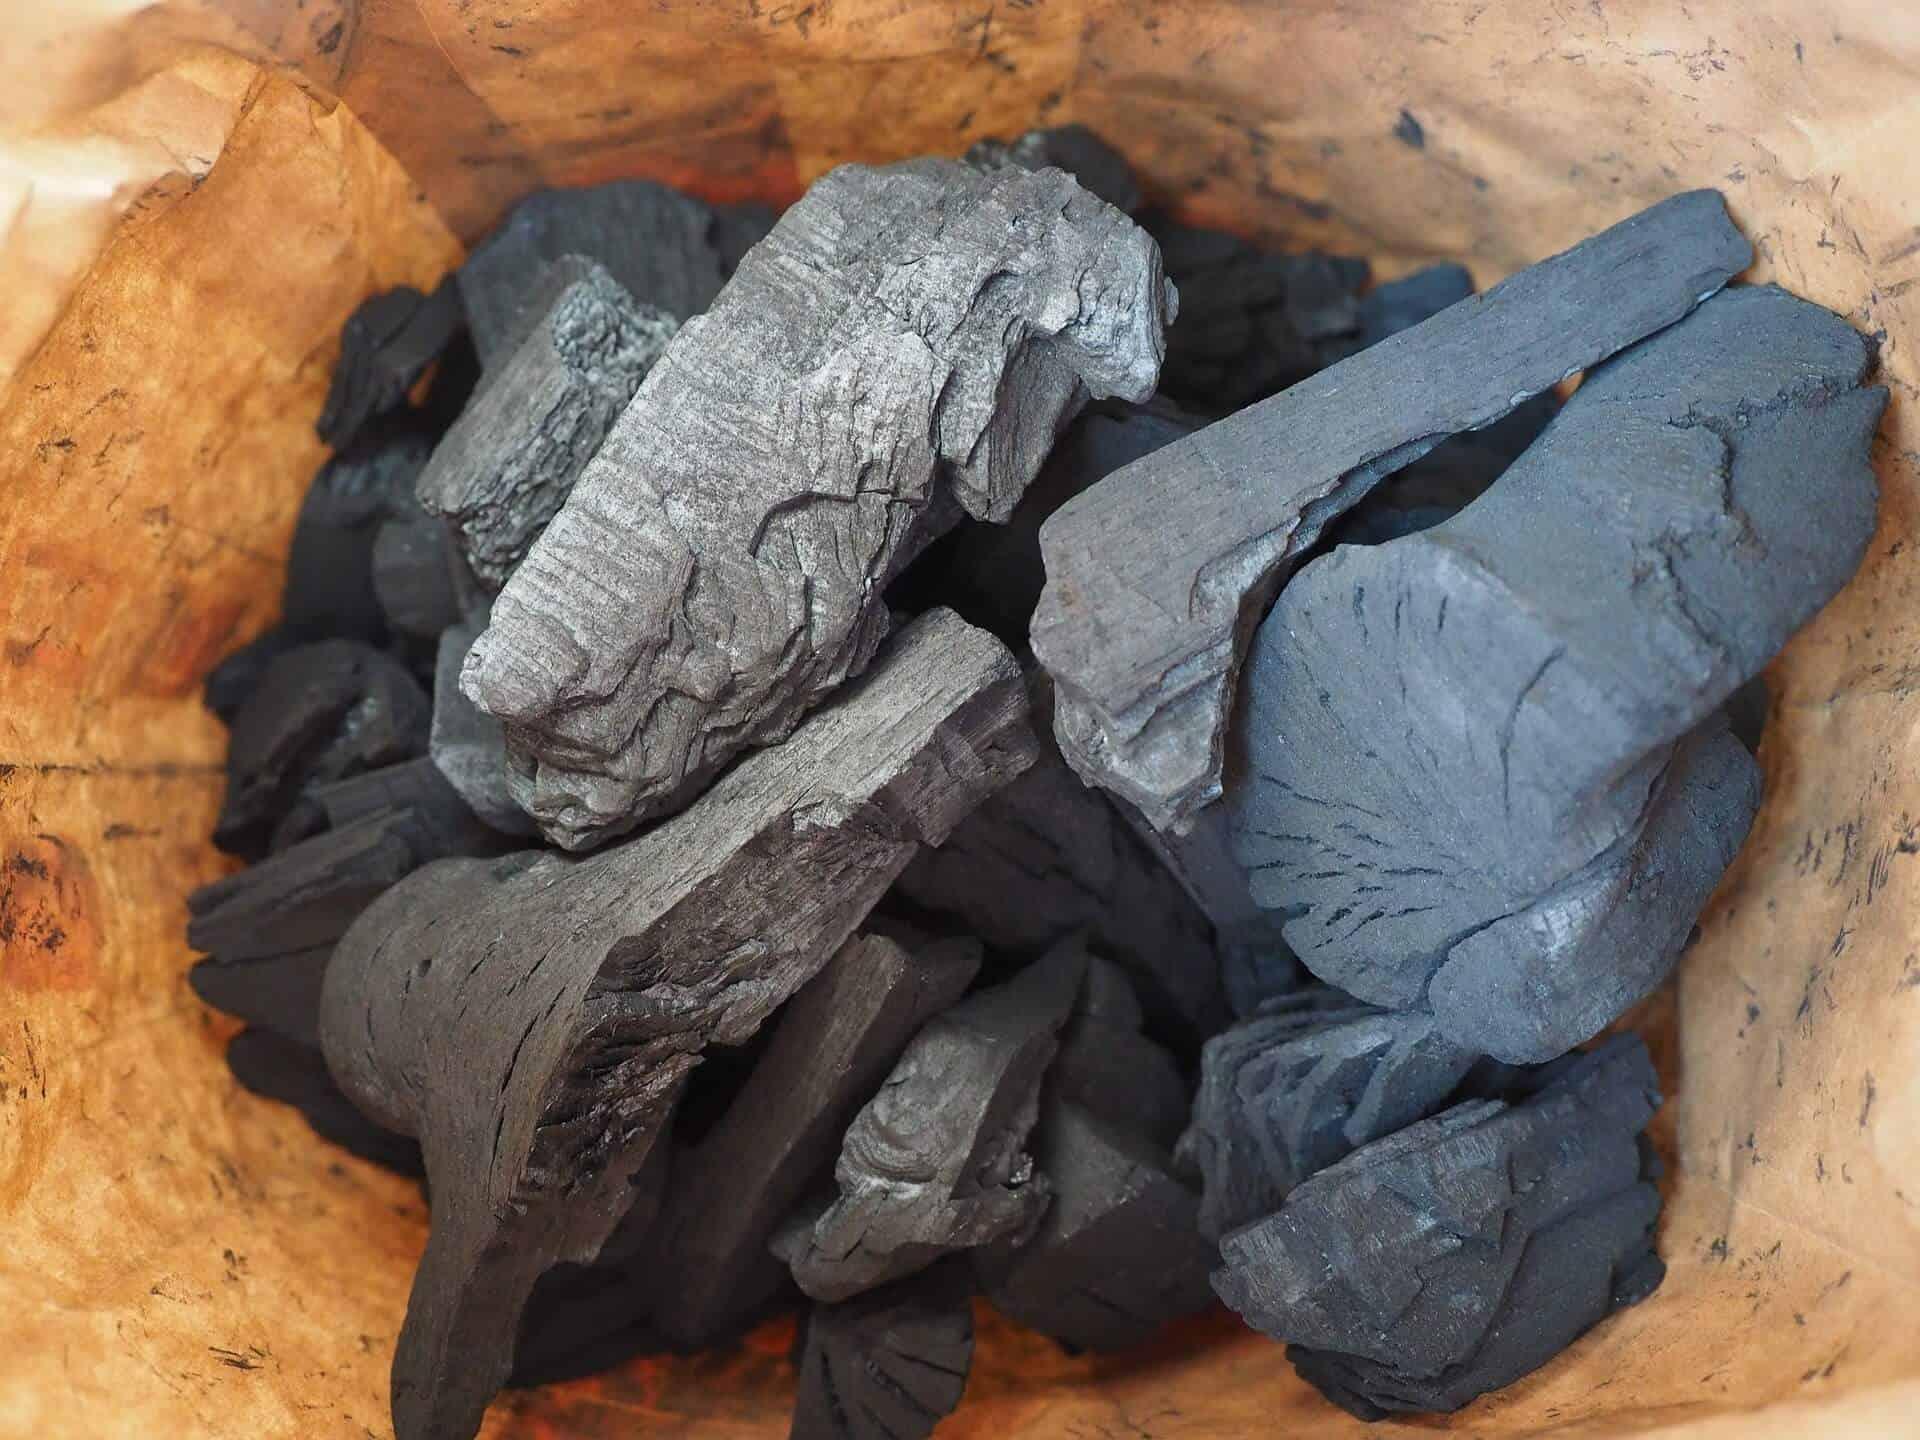 dog ate charcoal